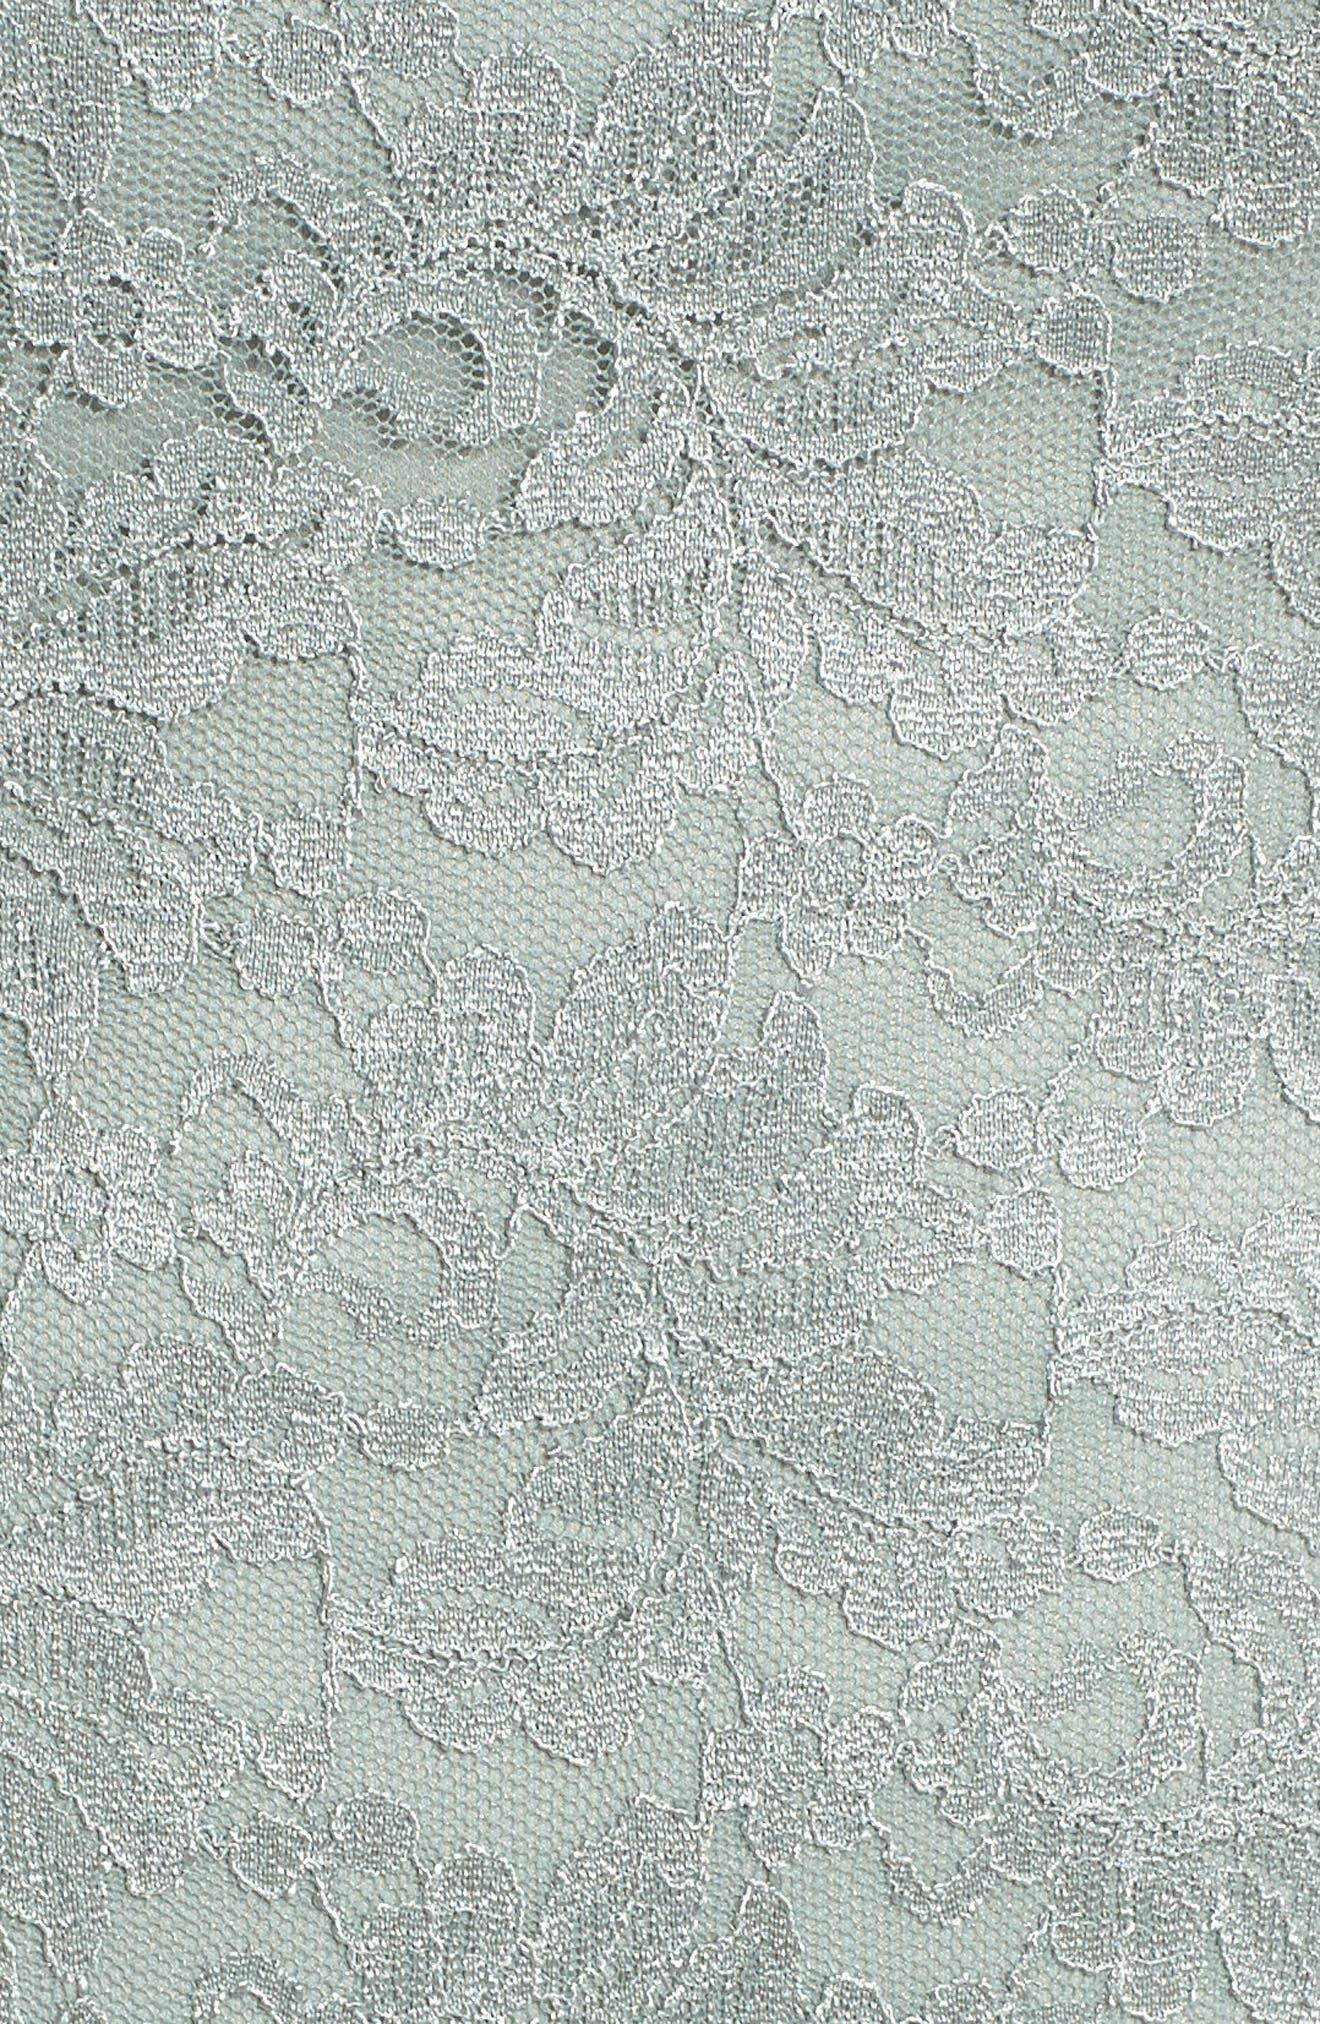 Lace Sheath Dress & Jacket,                             Alternate thumbnail 5, color,                             357